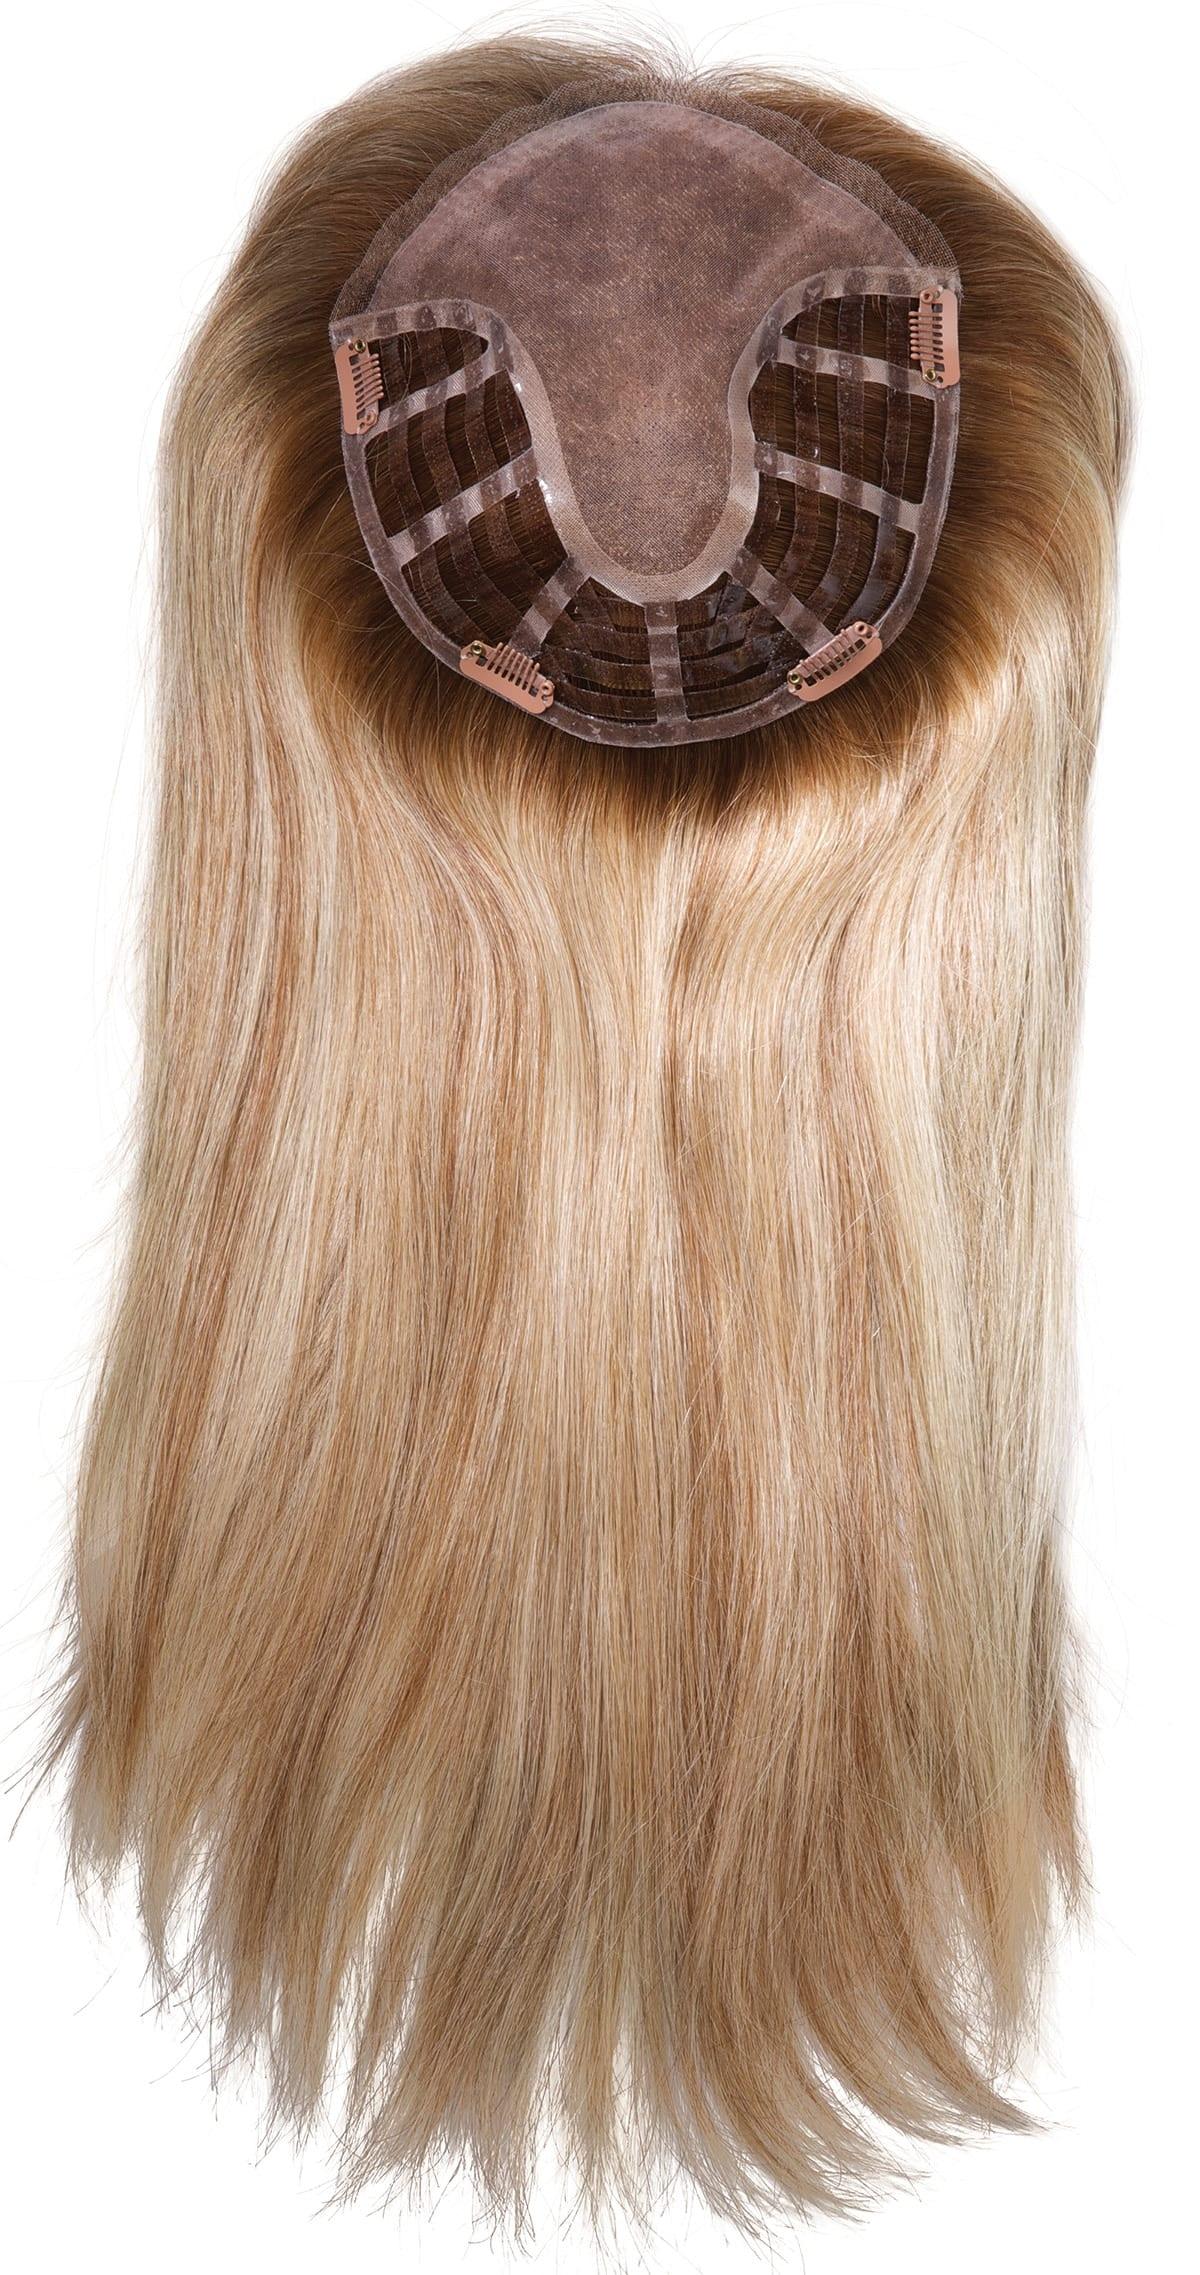 Matrix Human Hair Top Piece Ellen Wille Pure Power Collection